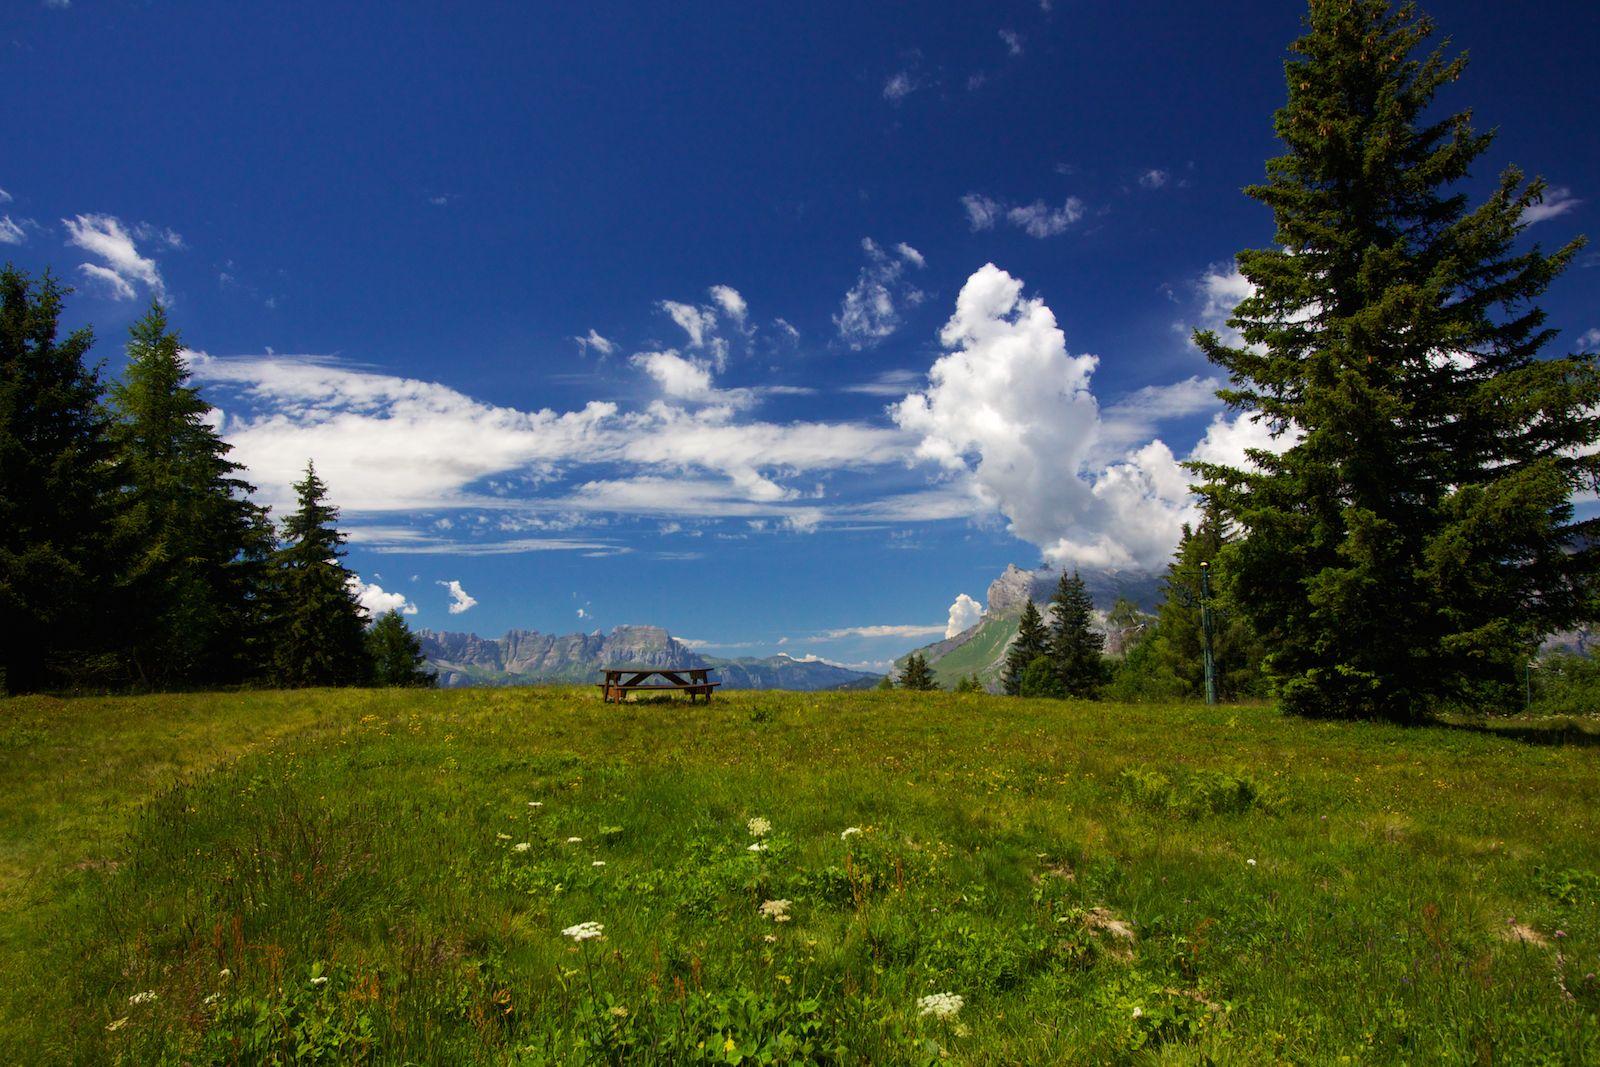 Alpine Picnic Table